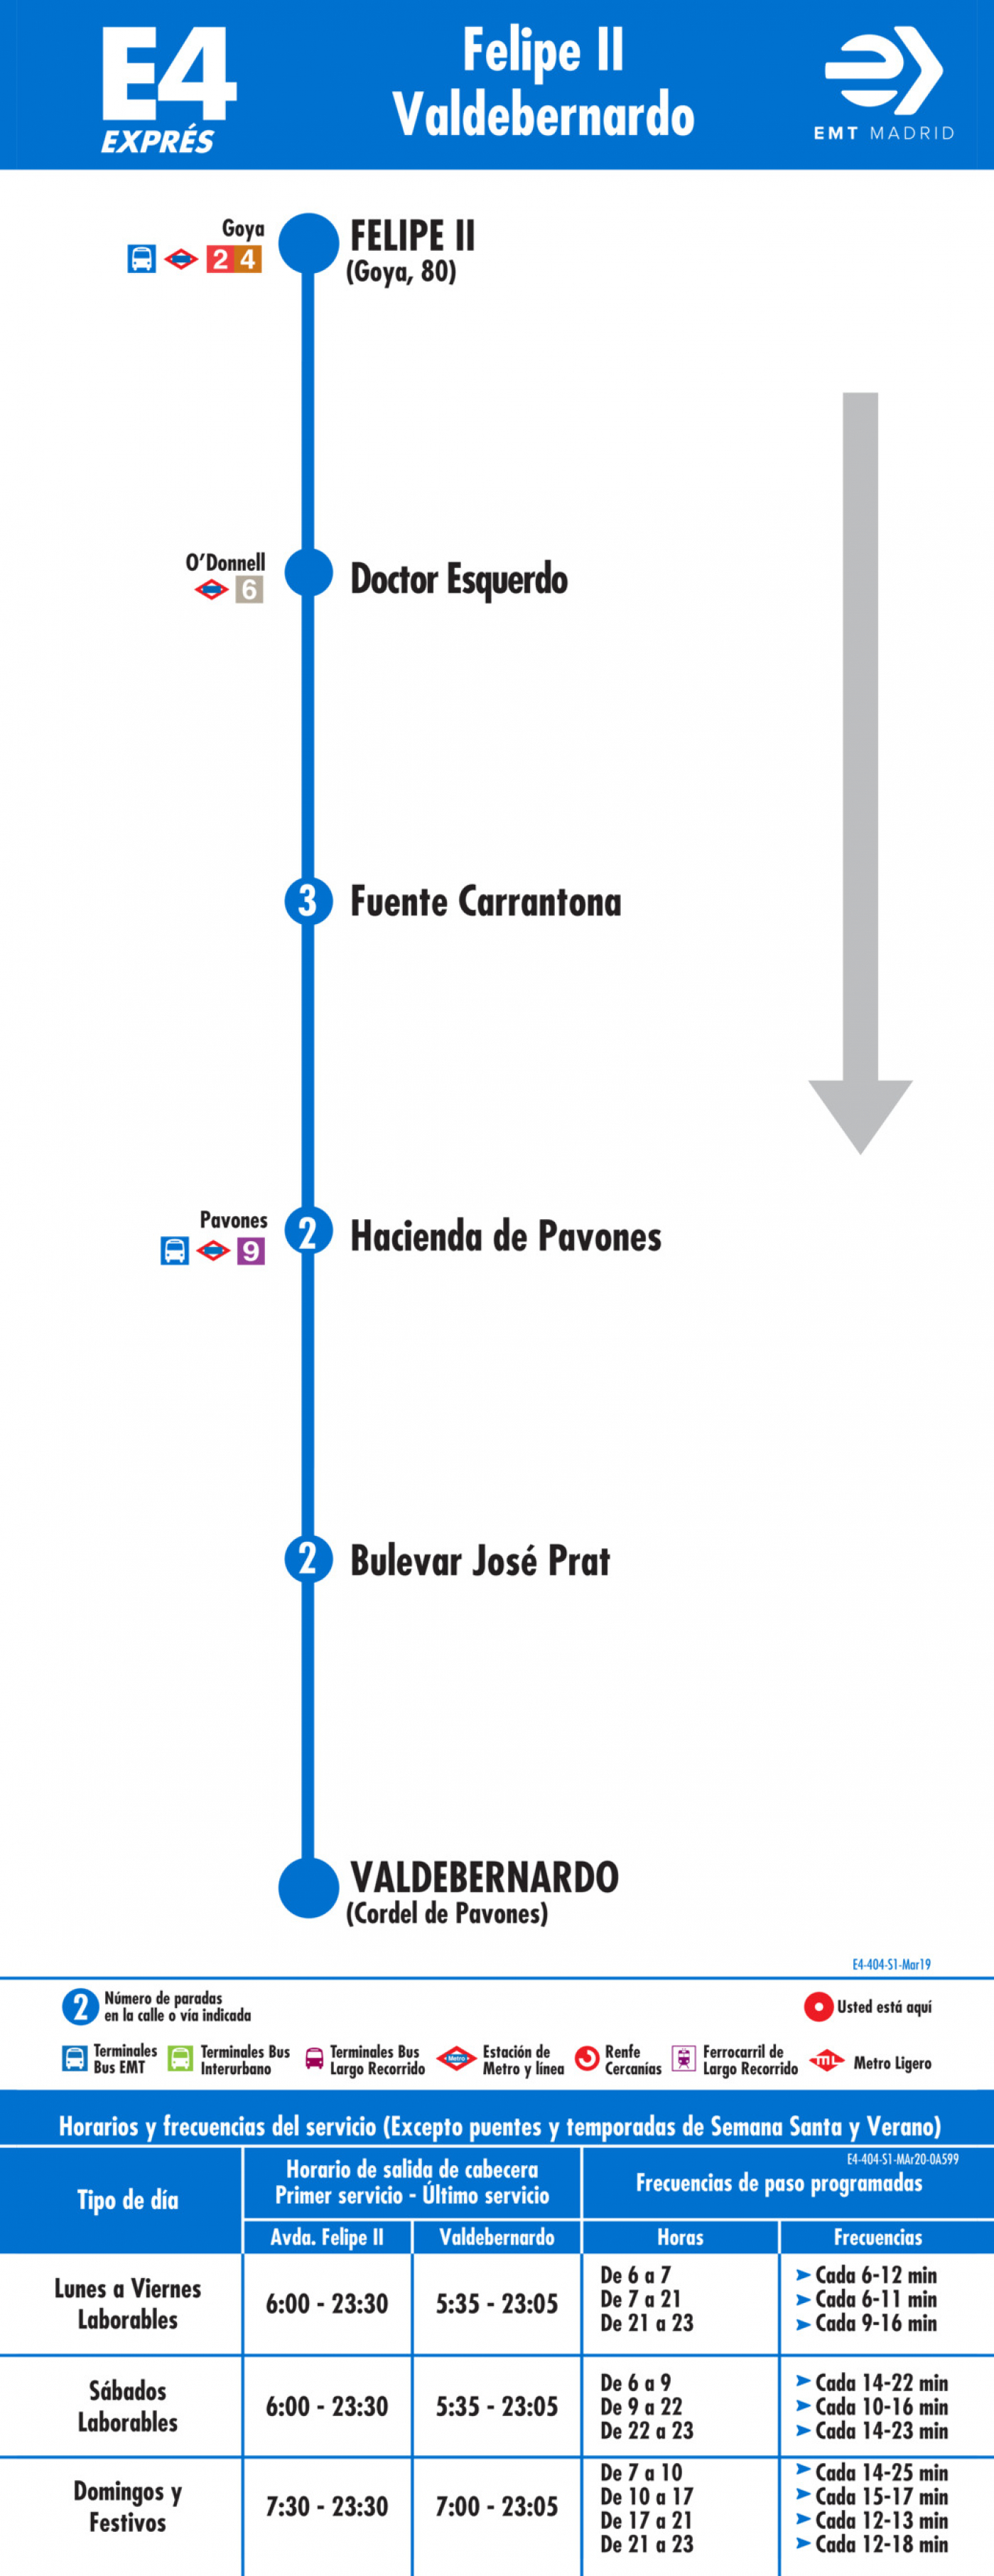 Tabla de horarios y frecuencias de paso en sentido ida Línea E4: Avenida de Felipe II - Valdebernardo